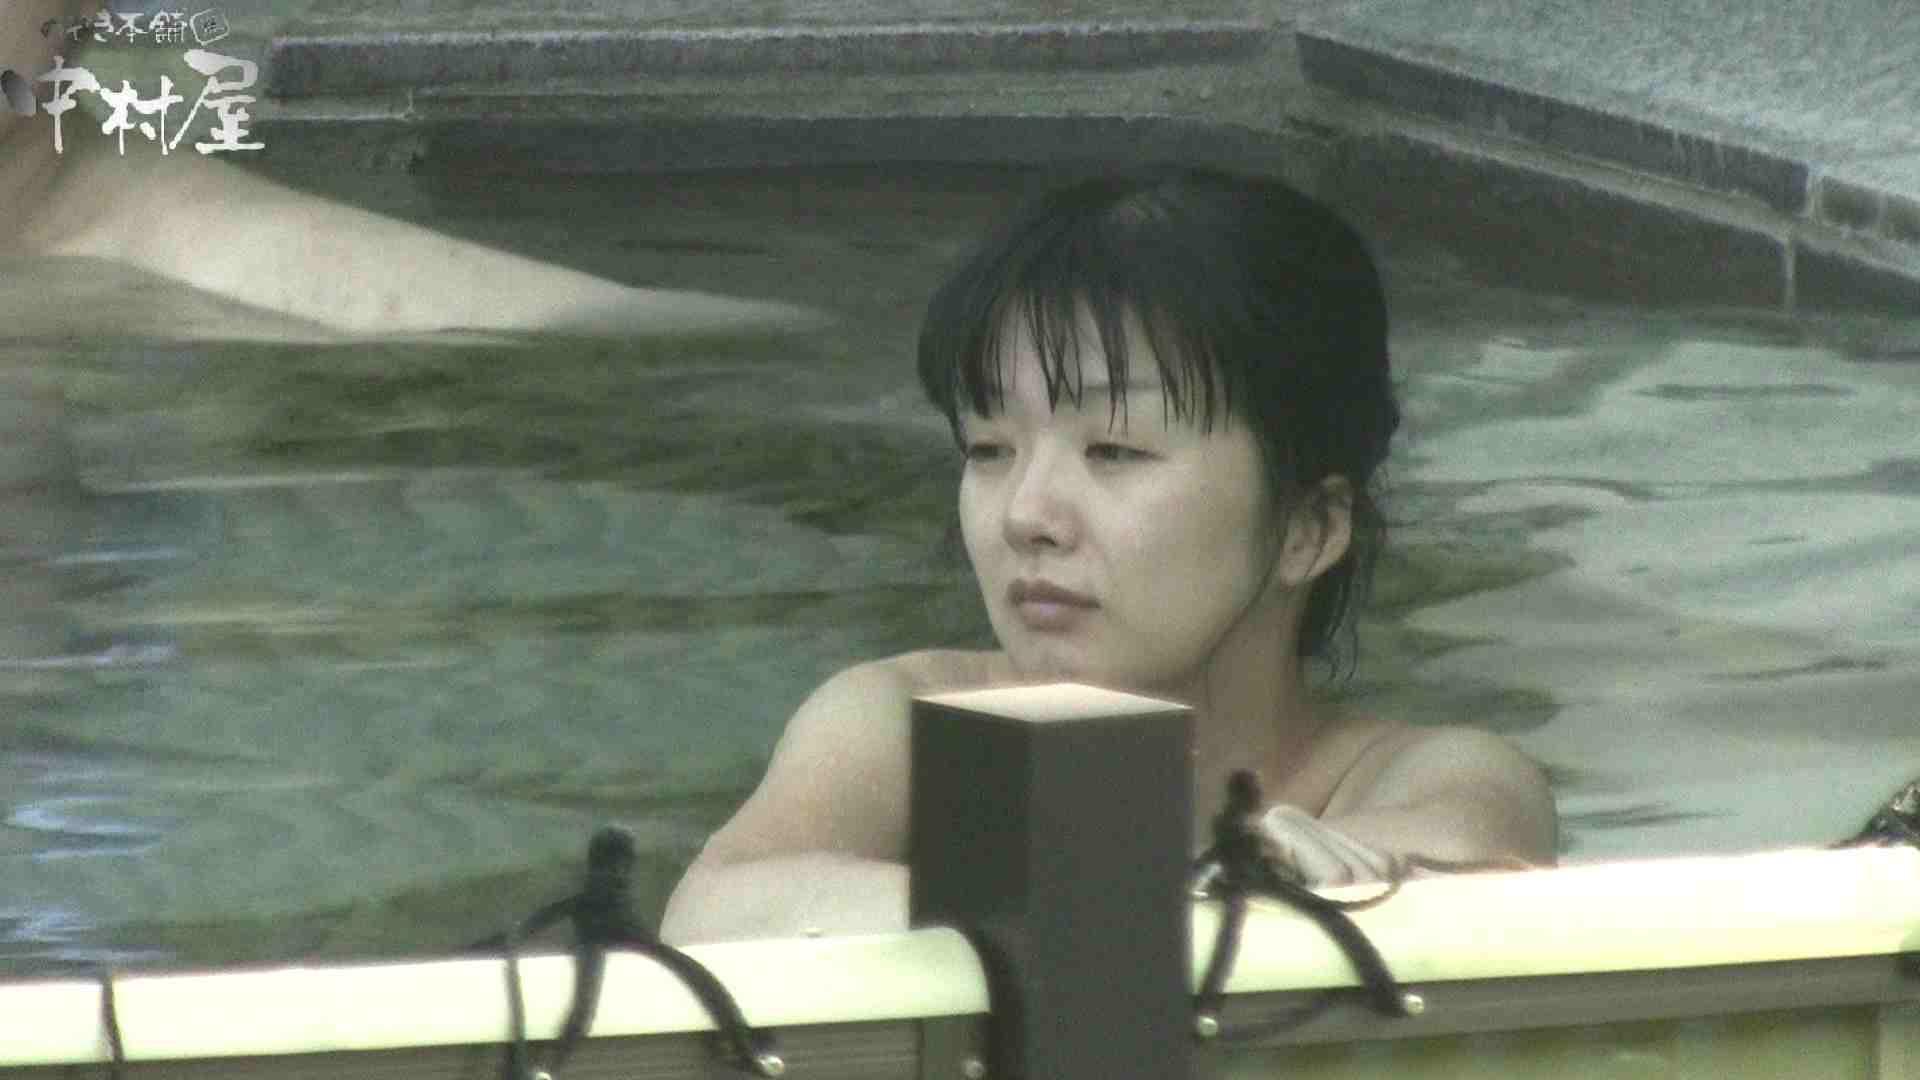 Aquaな露天風呂Vol.904 美しいOLの裸体 オメコ動画キャプチャ 103pic 44